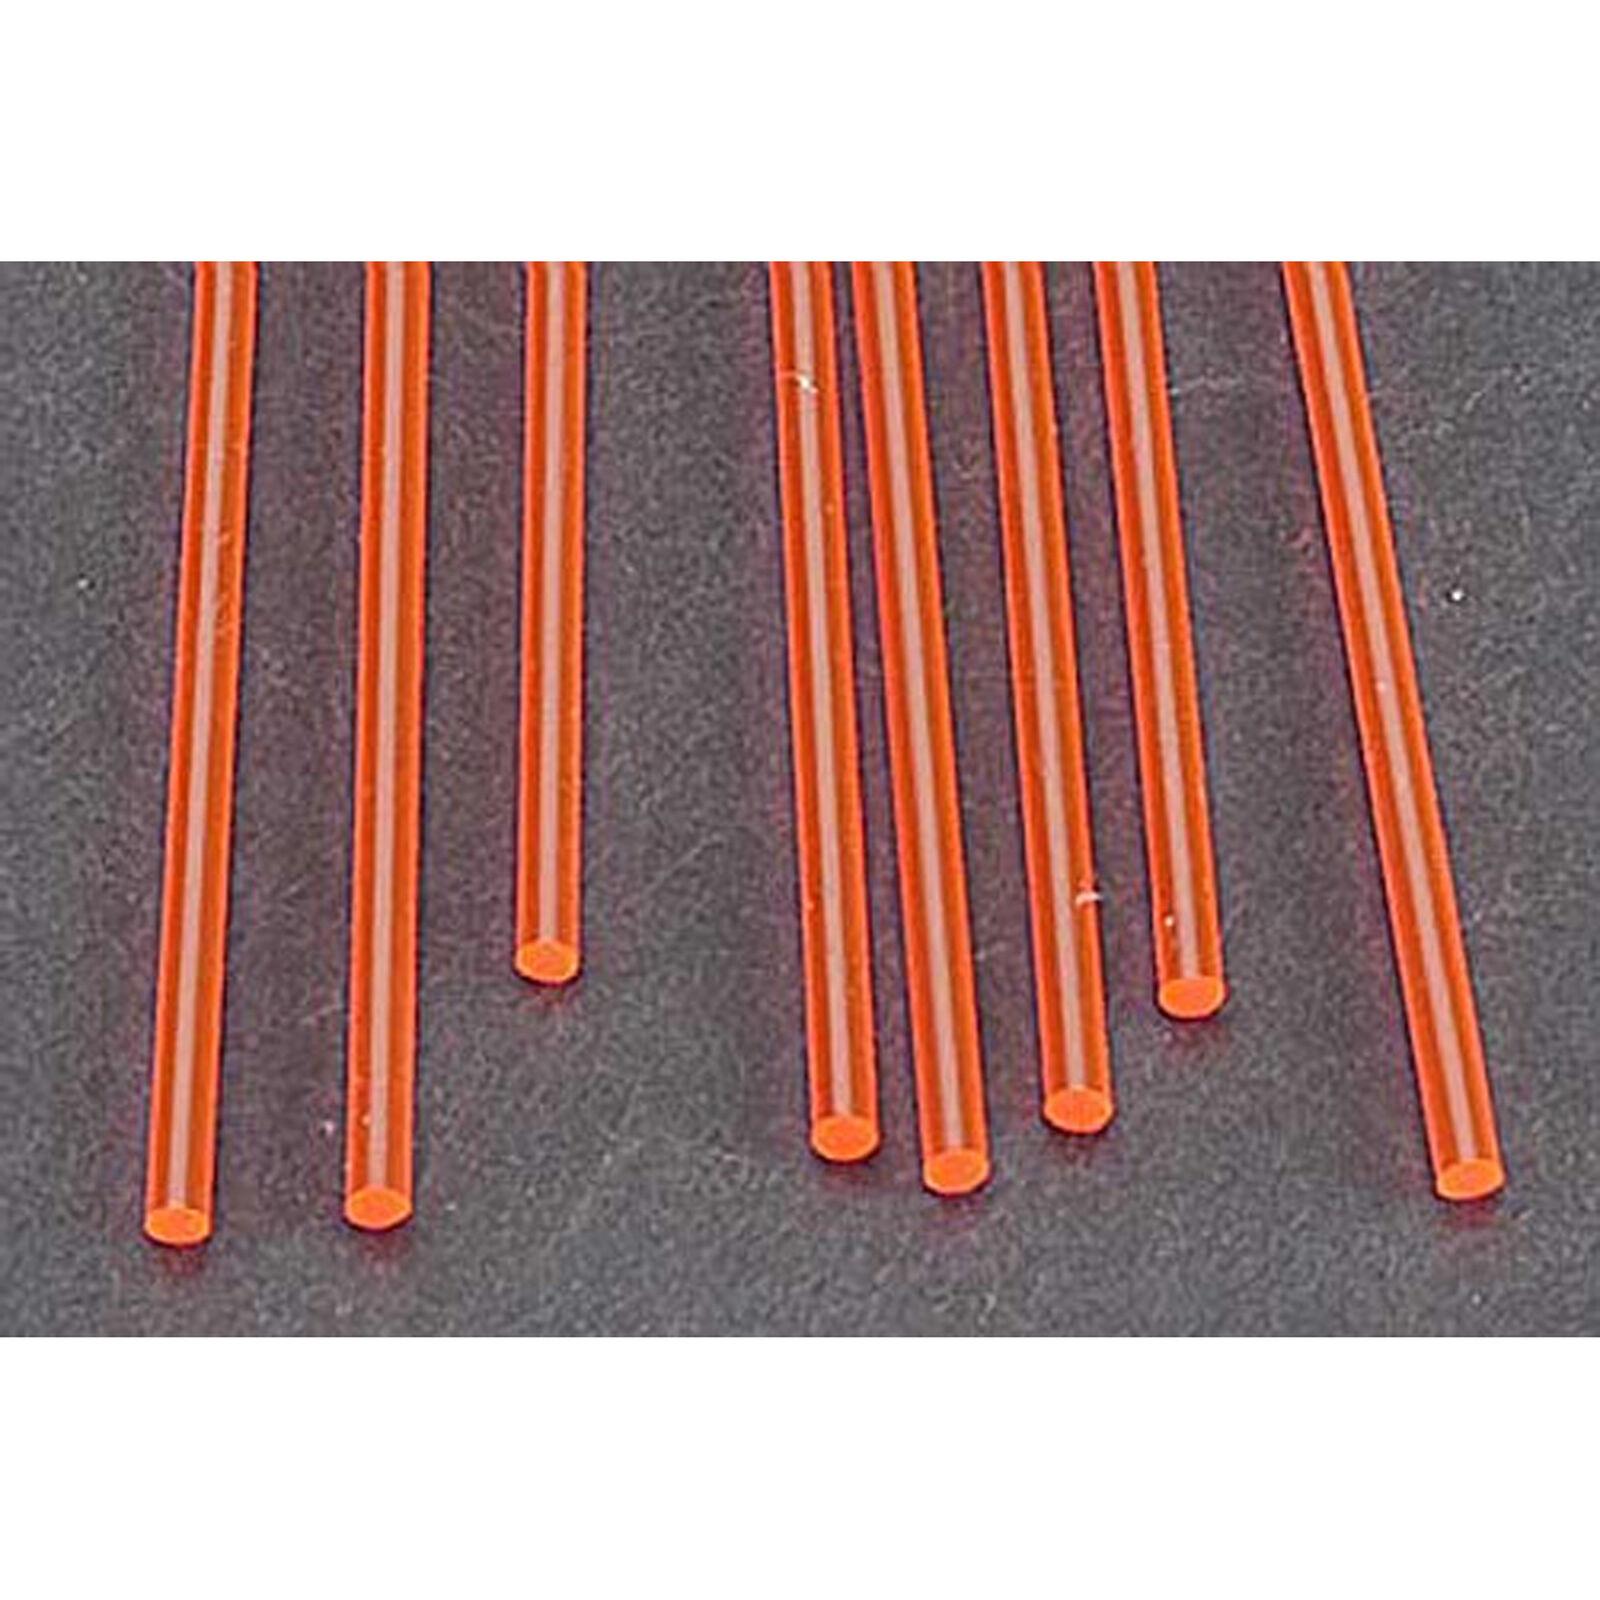 "FARR-3H Fluor Red Rod,3/32"" (8)"